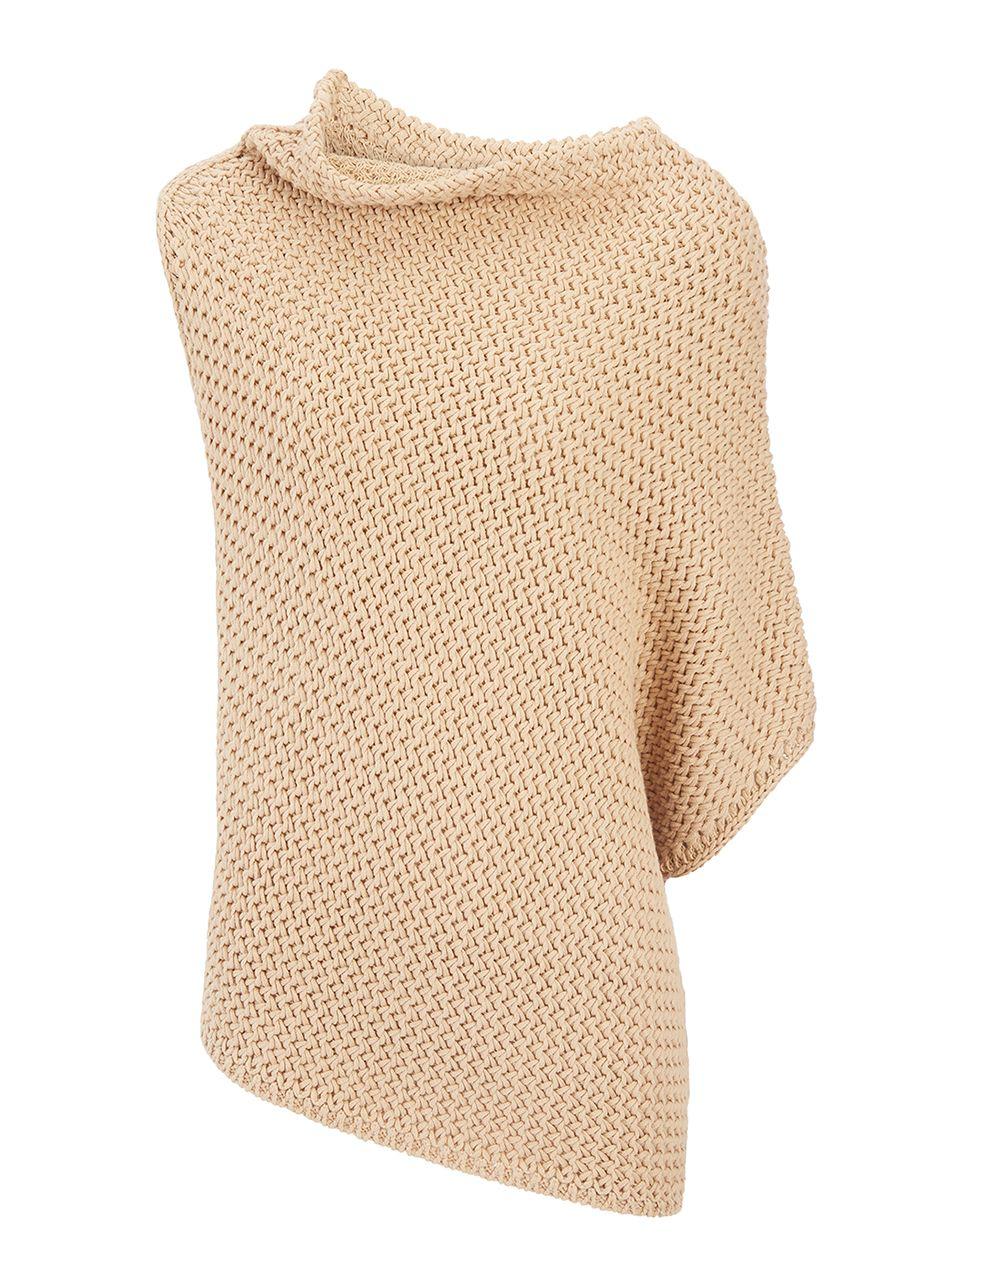 Joseph open basket weave sleeveless knit at joseph knit joseph open basket weave sleeveless knit at joseph bankloansurffo Images